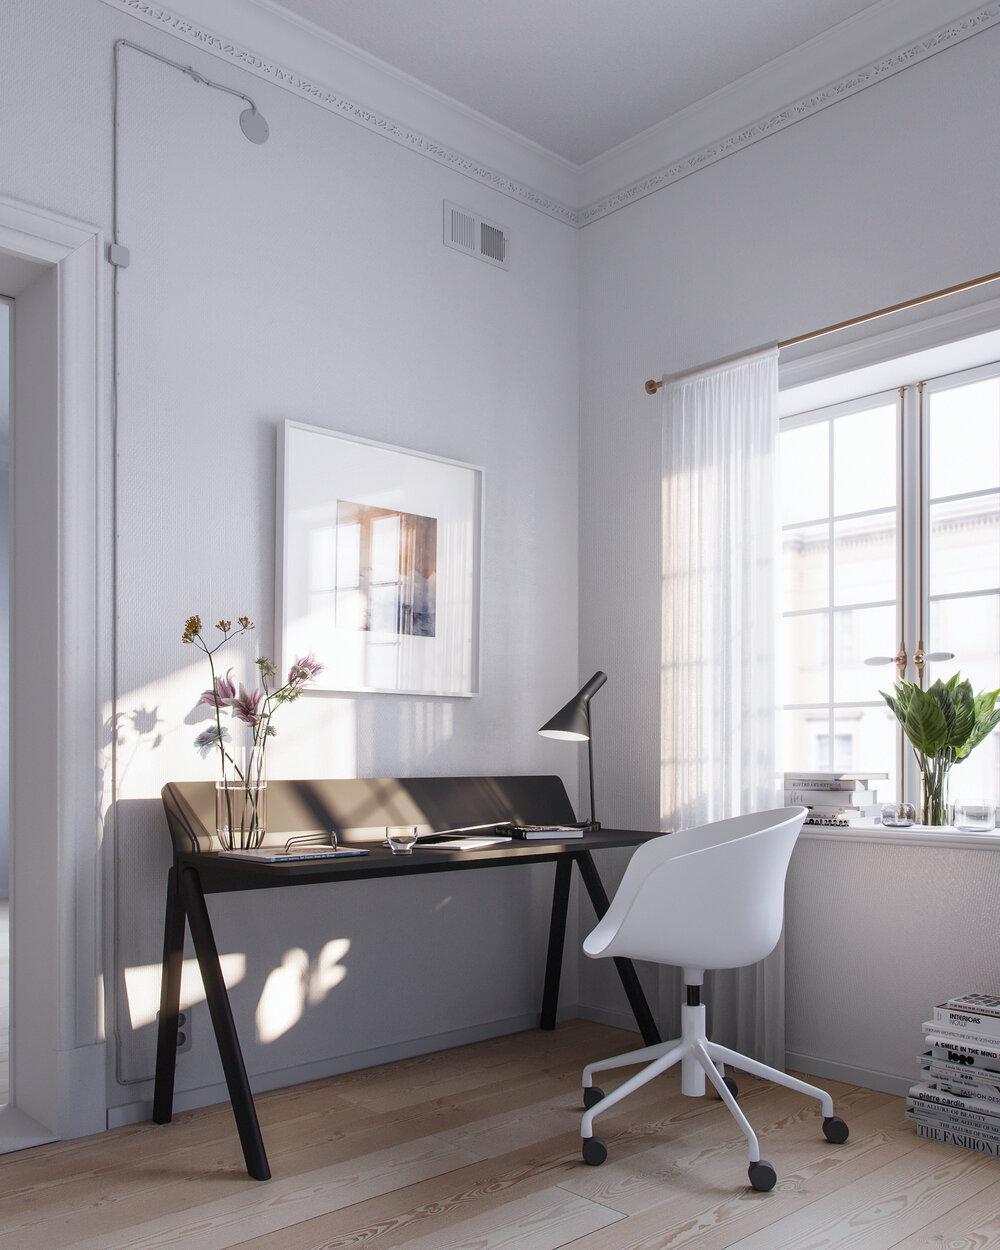 Nordic Living - Workspace